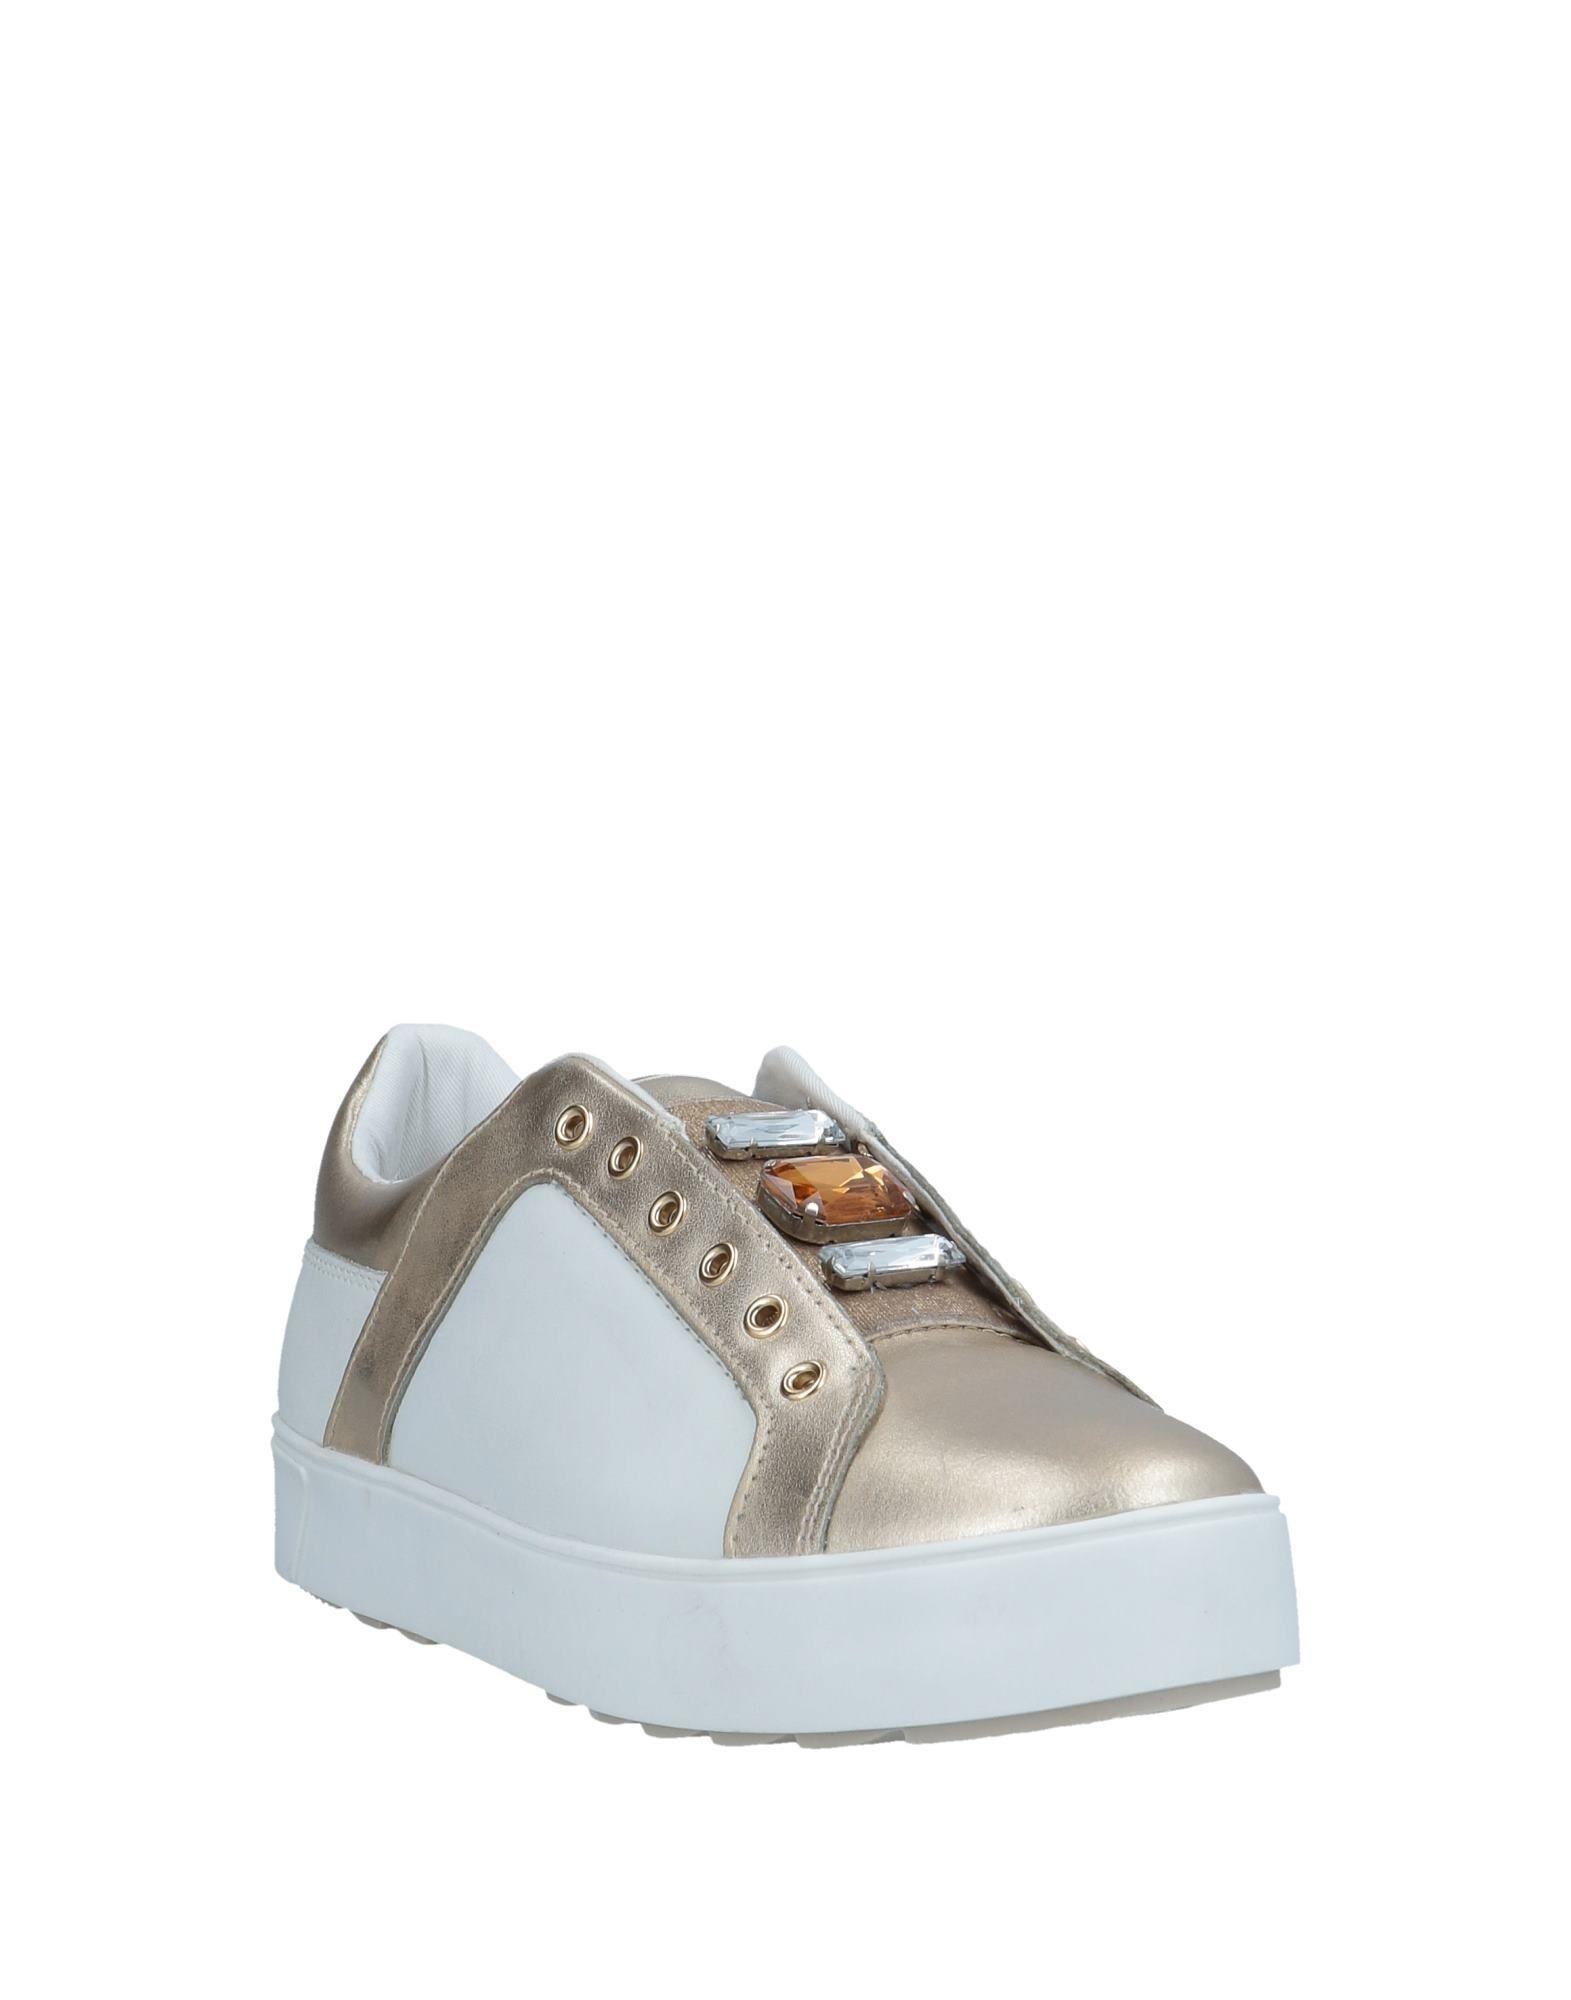 Apepazza Sneakers Damen  11392476KG Schuhe Gute Qualität beliebte Schuhe 11392476KG e6a632